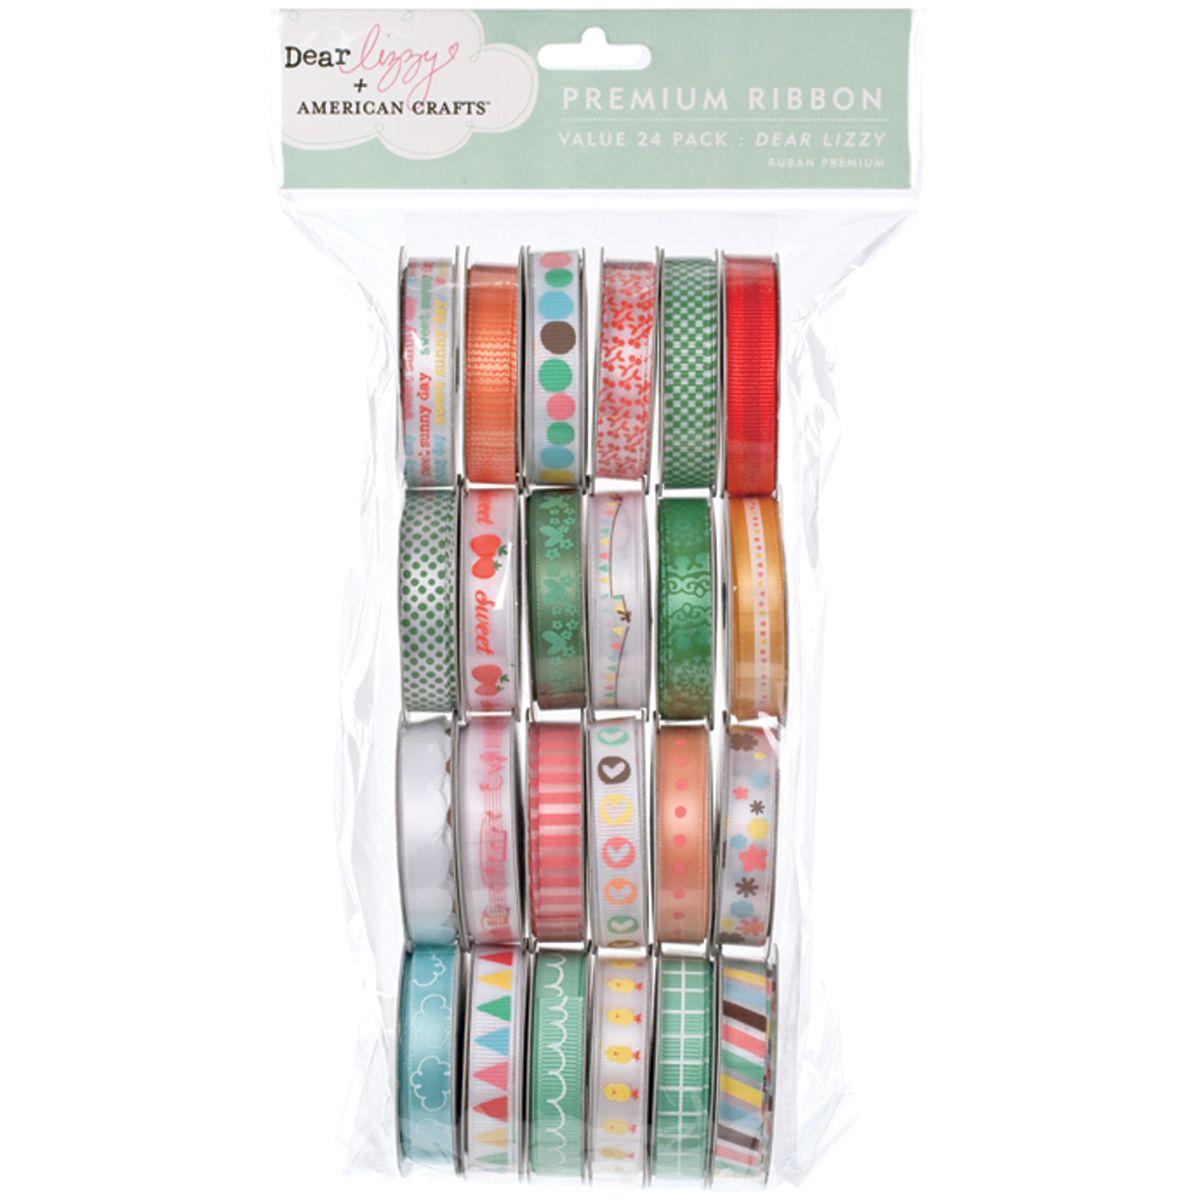 American Crafts Value Pack Premium Ribbon 24 Spools